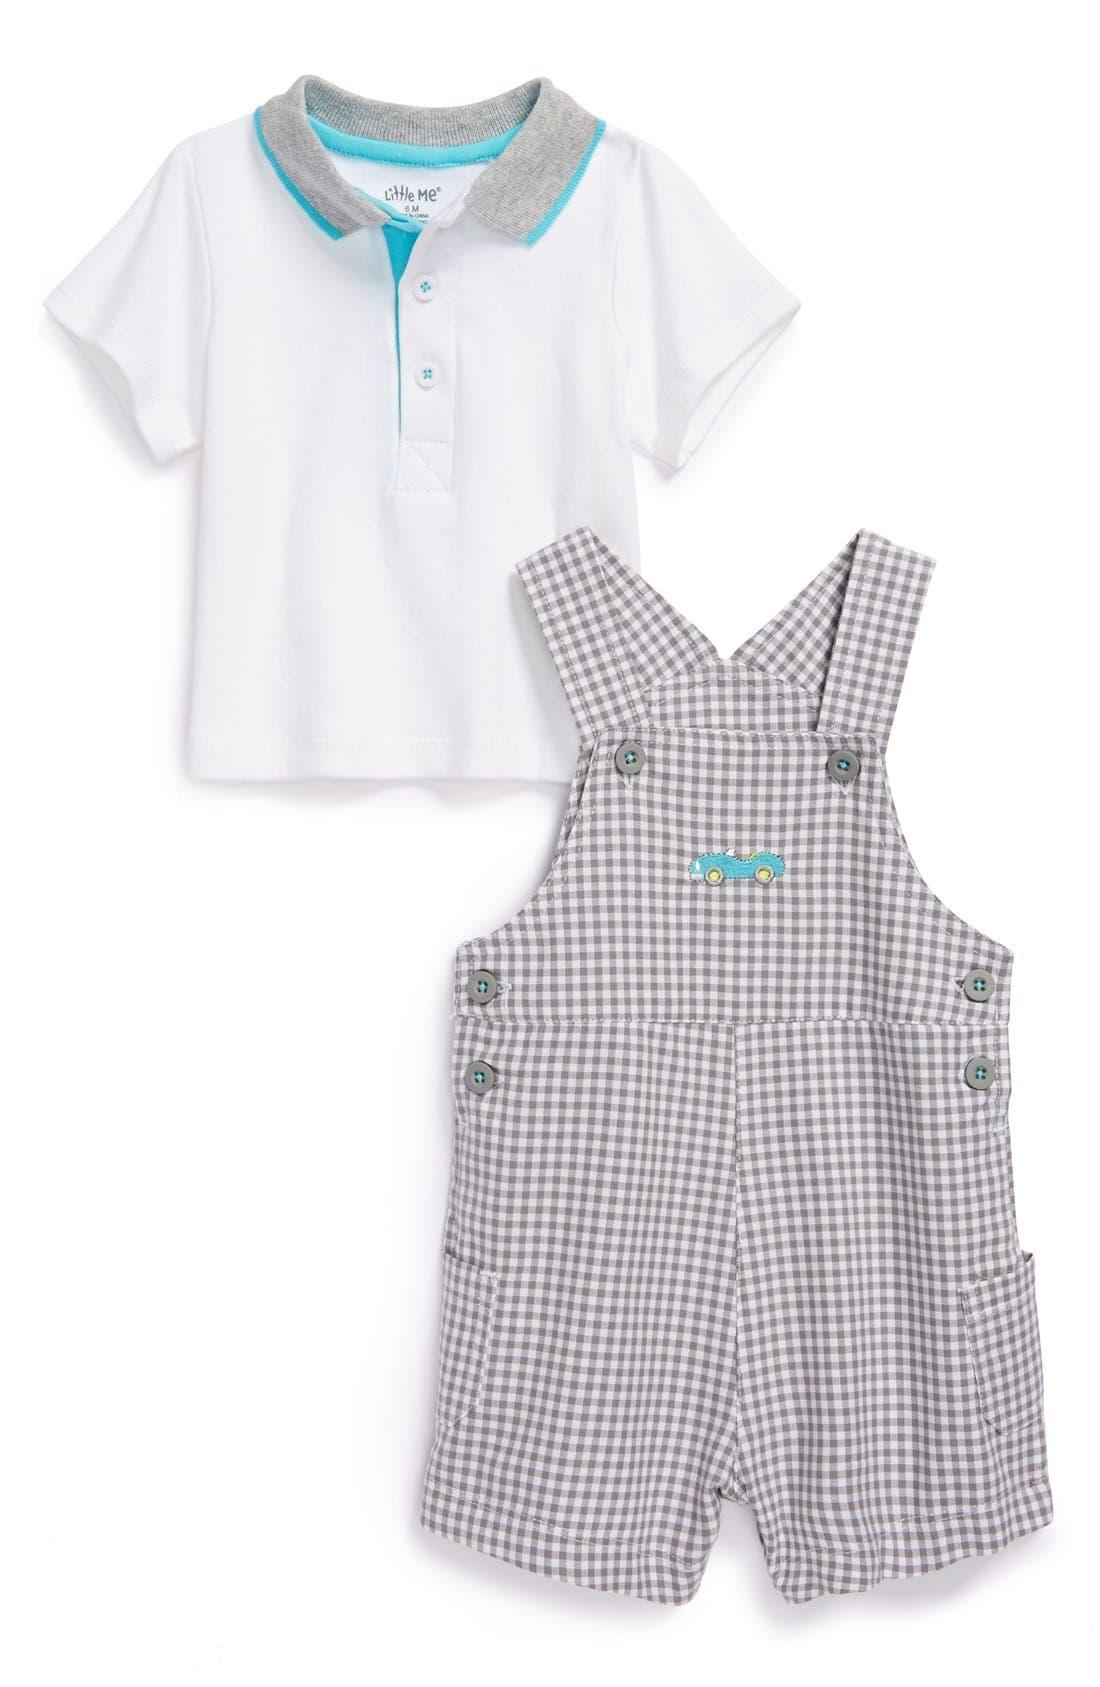 Main Image - Little Me 'Automobile' Polo Shirt & Shortalls (Baby Boys)